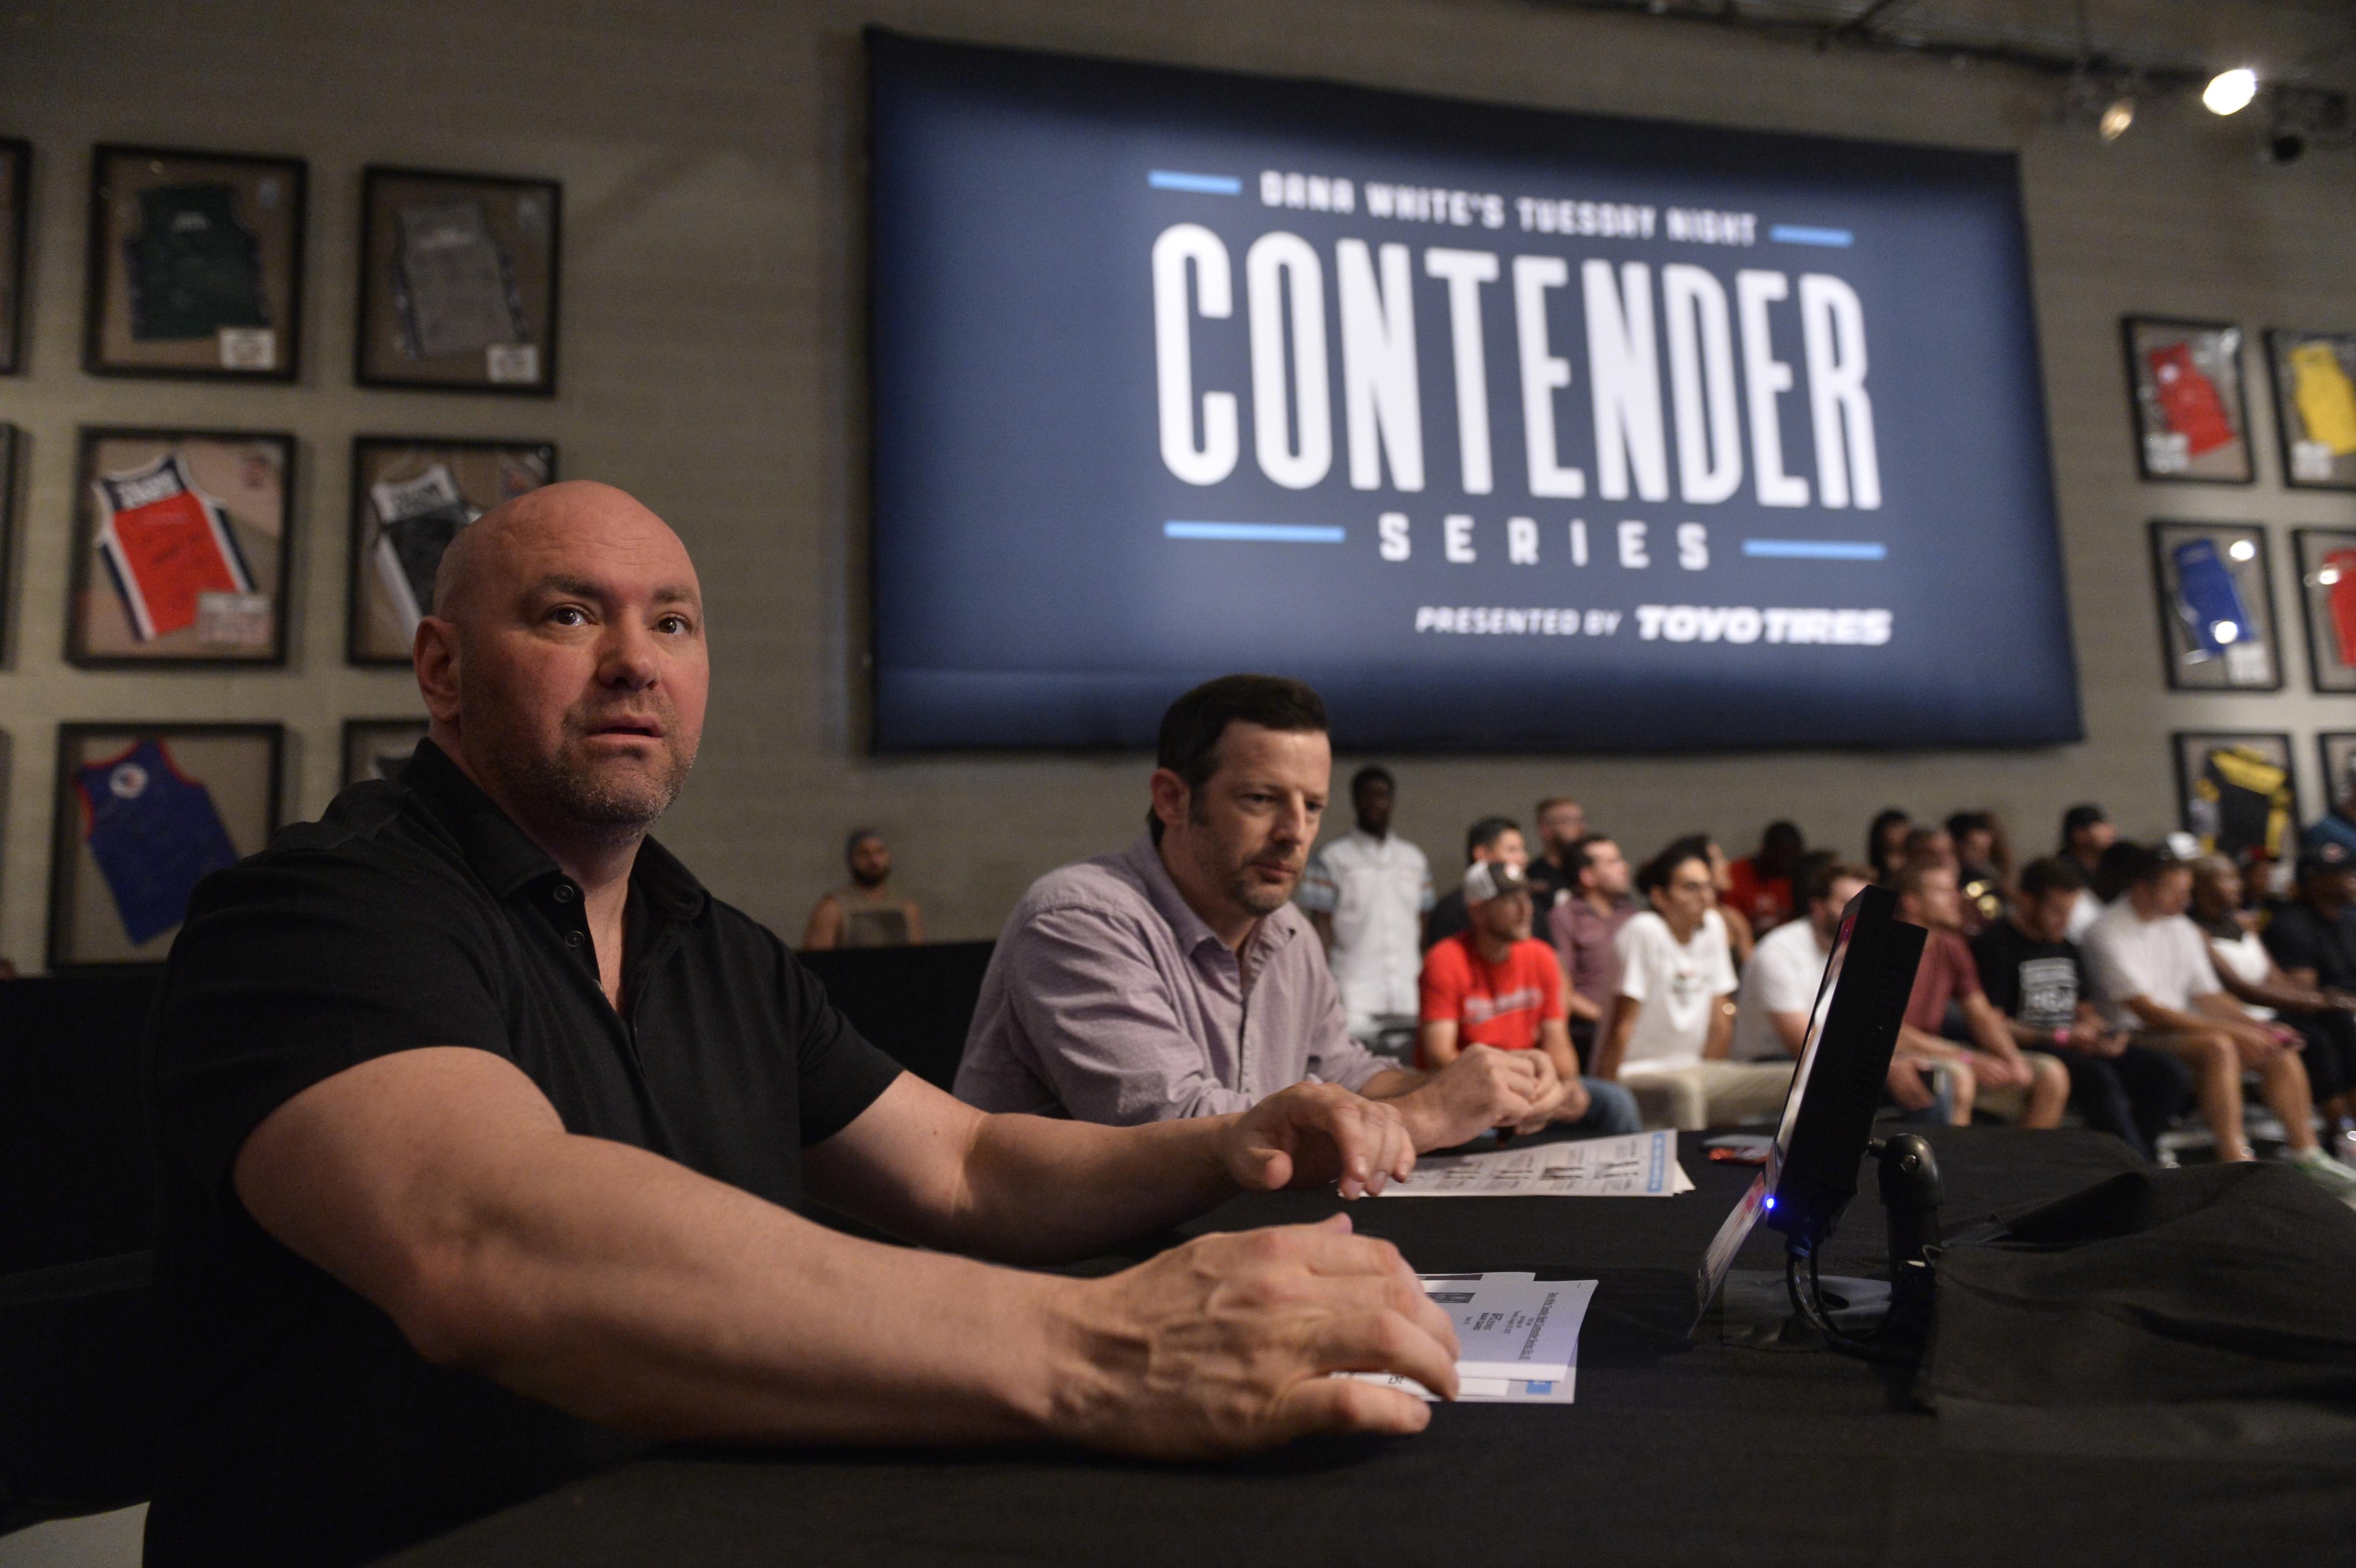 Dana White's Tuesday Night Contender Series: Mayes v Crowder